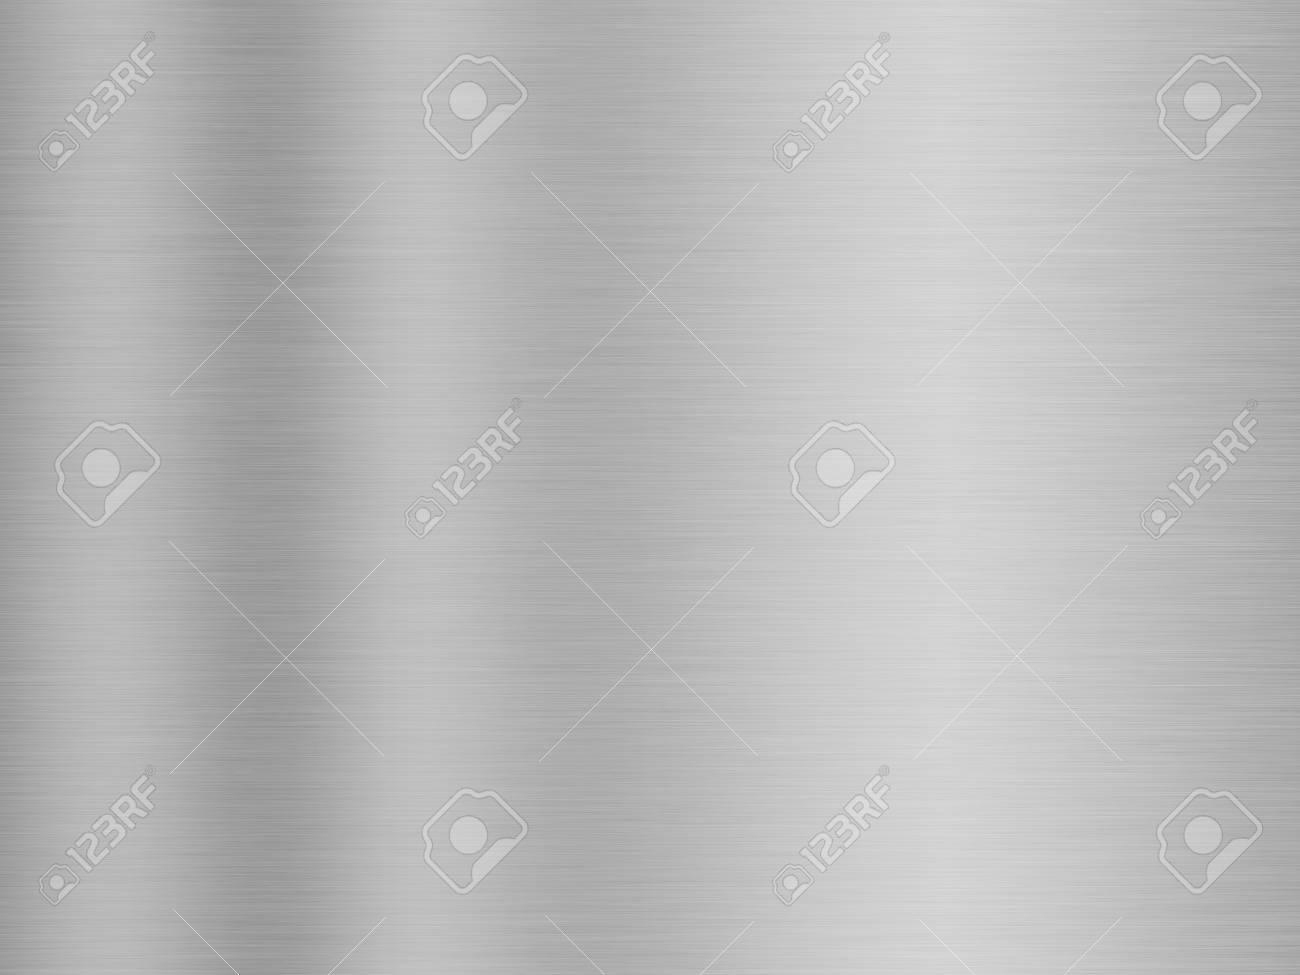 texture en acier inoxydable ou en métal texture de fond Banque d'images - 75076754